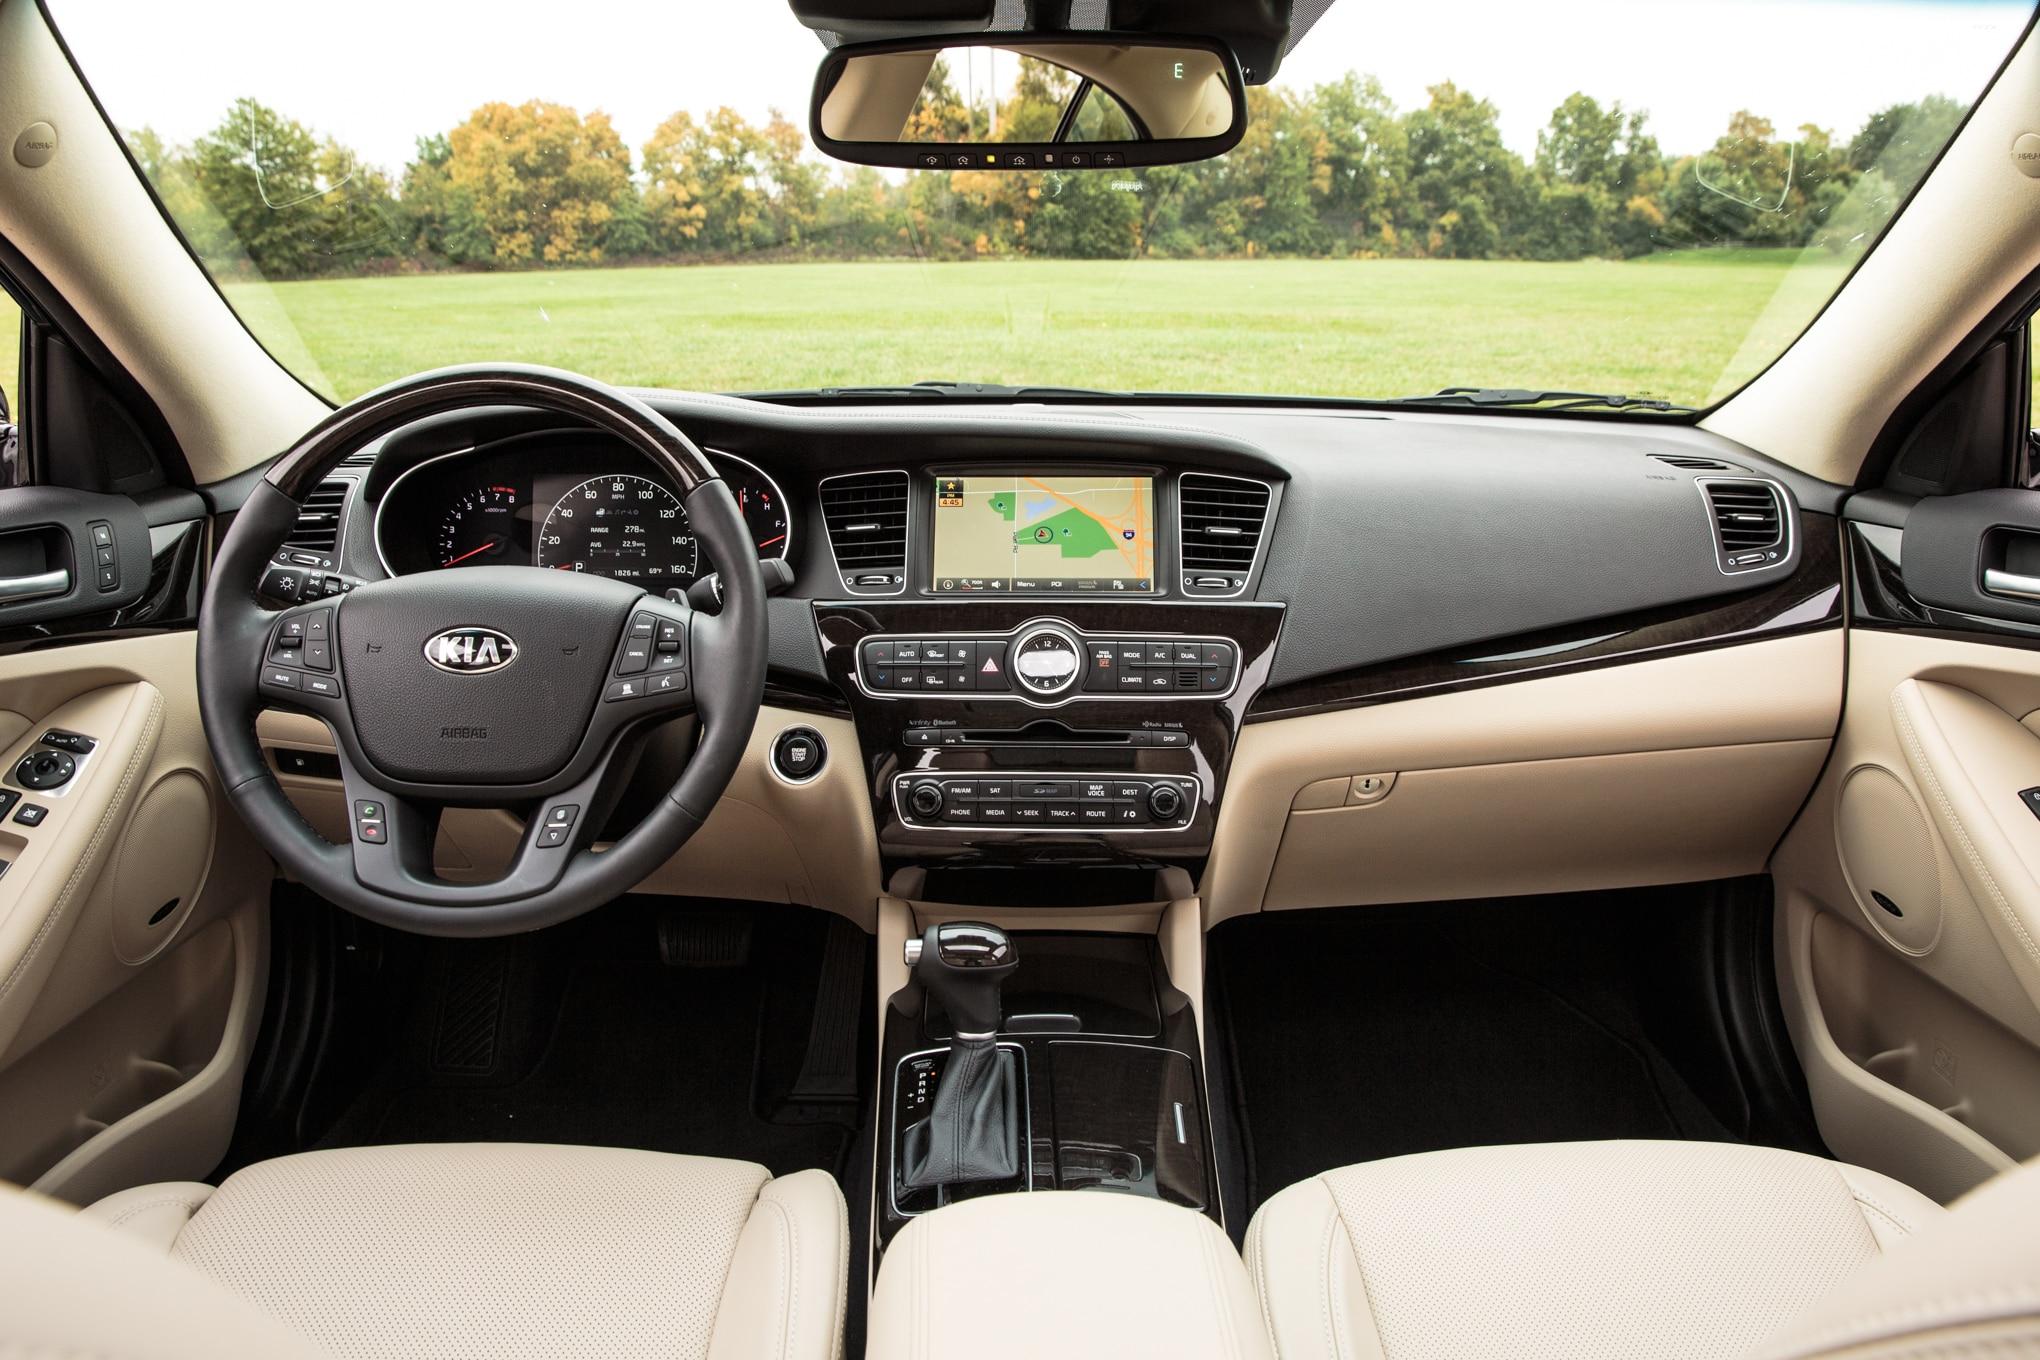 segment luxury is newsday image classifieds sedan into cadenza s cars near entry automaker flawless kia